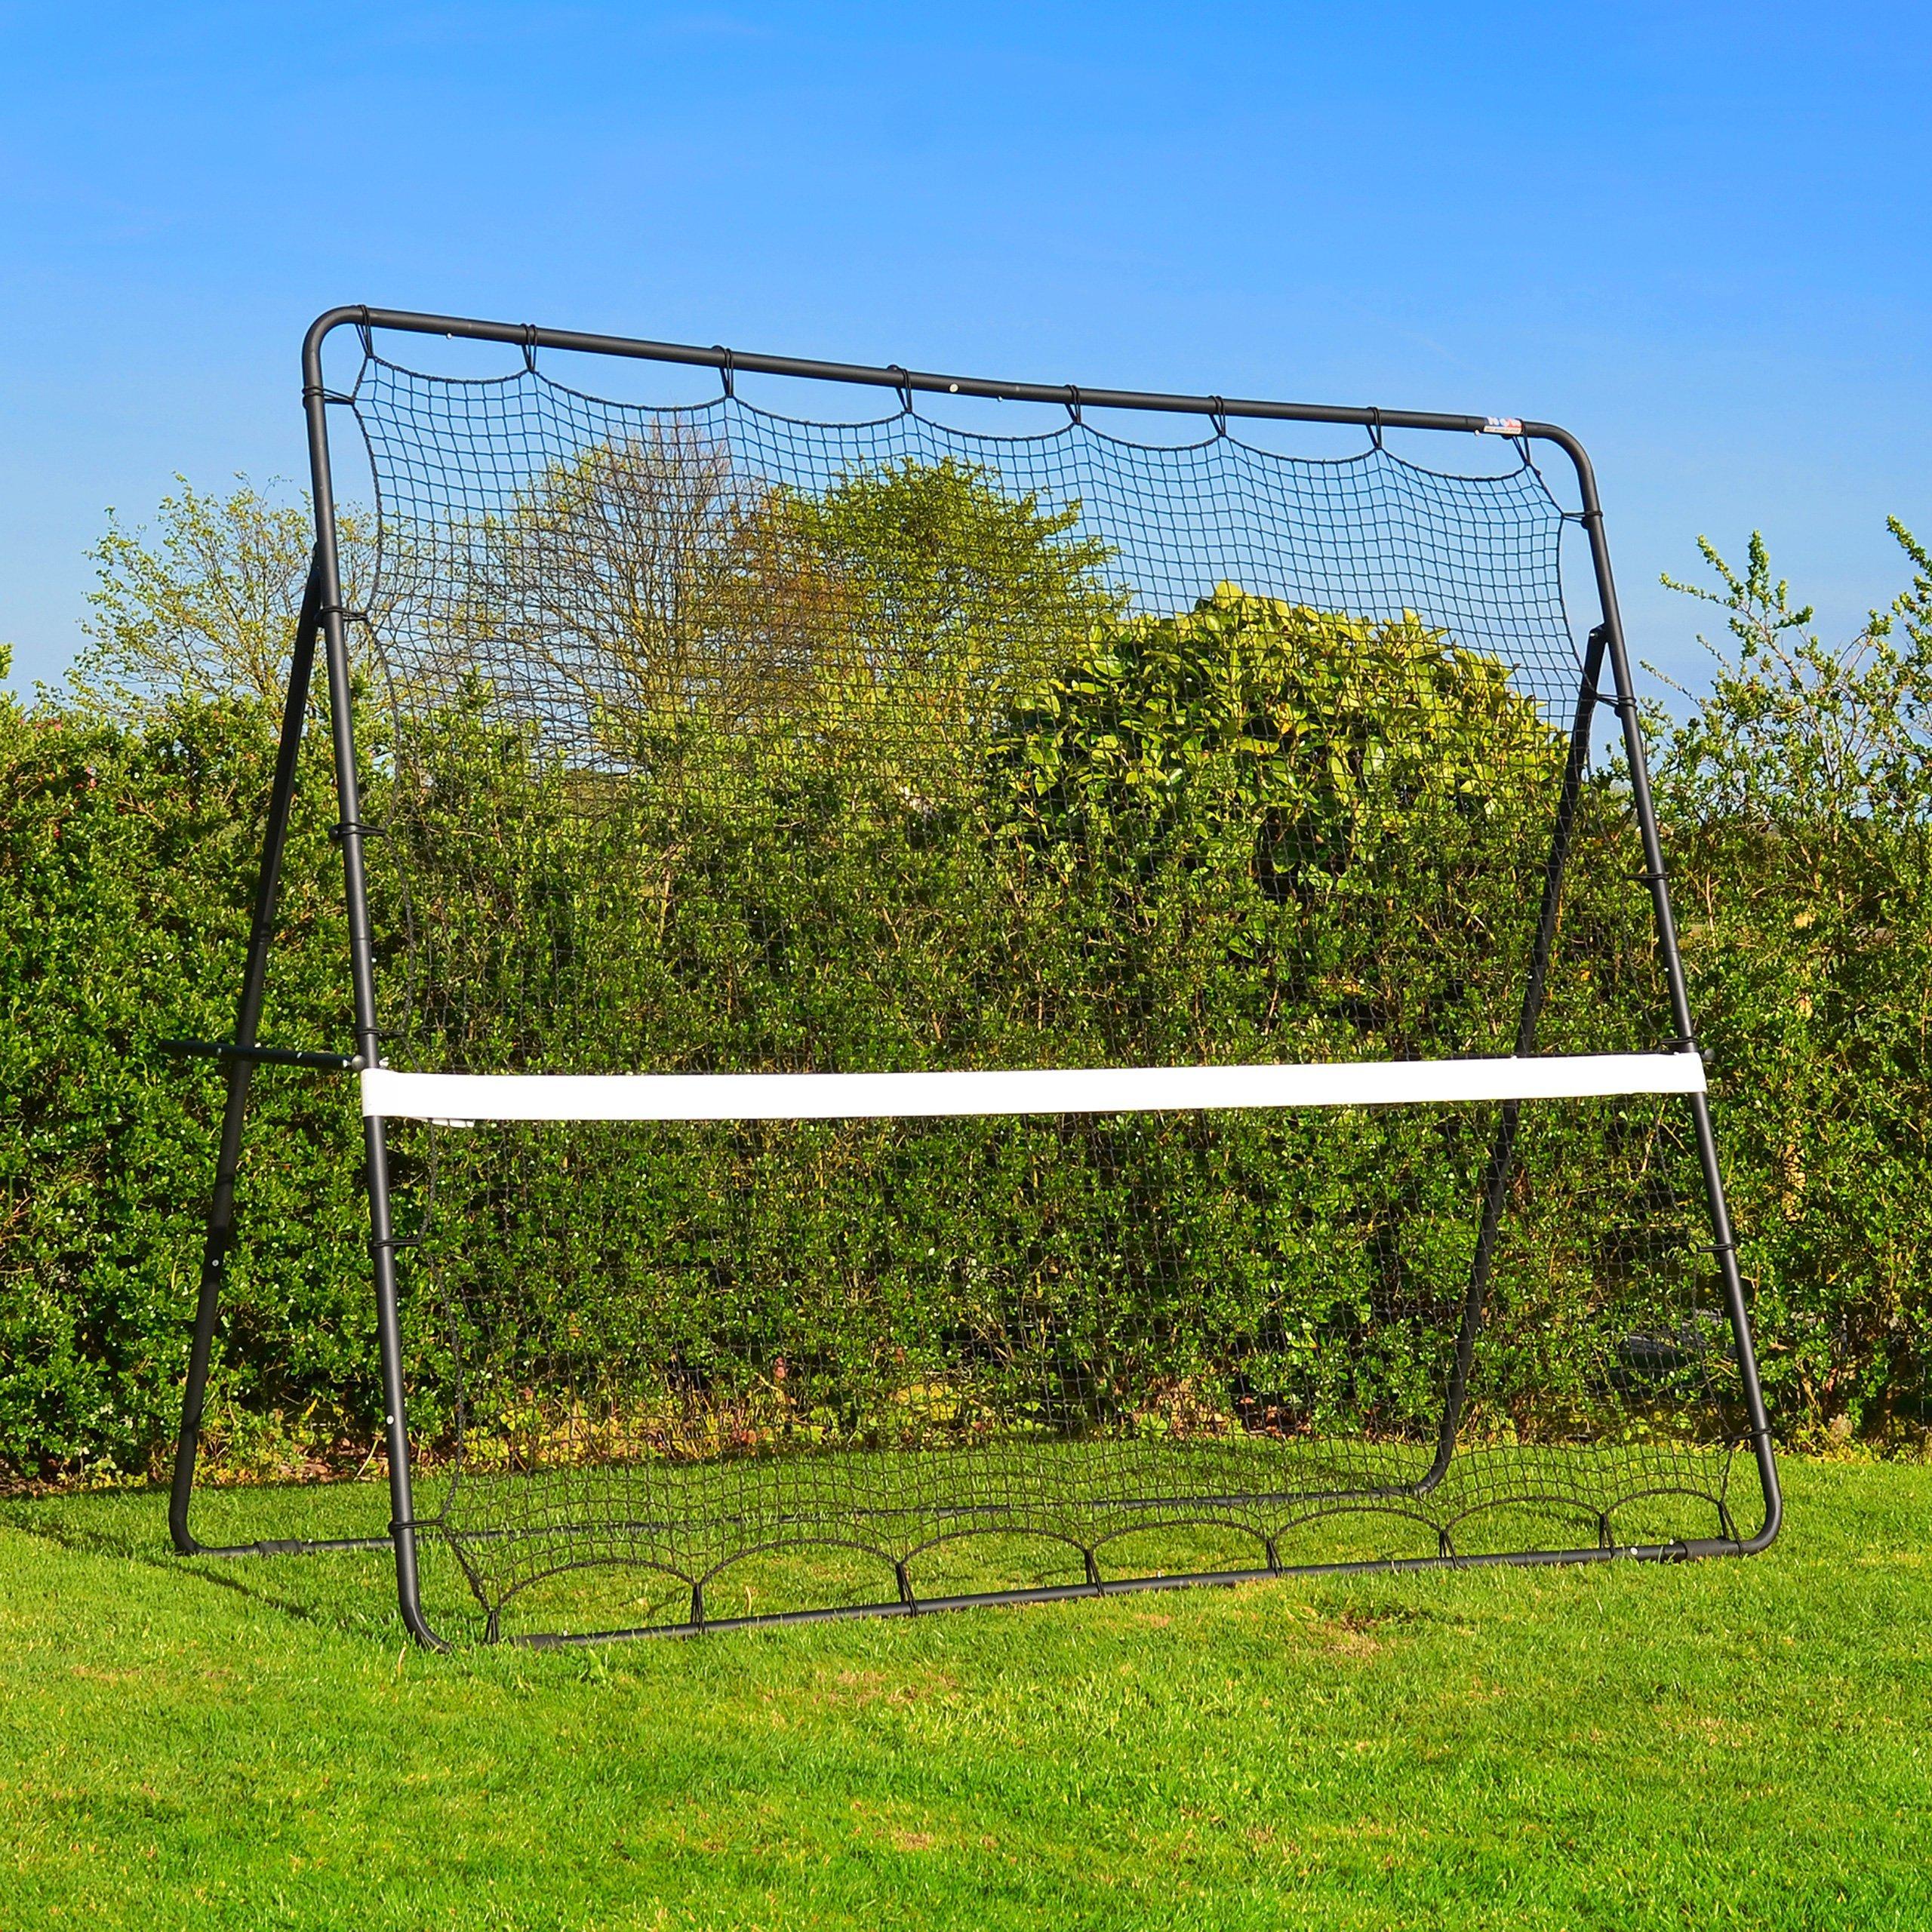 Soccer Rebound Net Trainer - 9' x 7' [Net World Sports] by Net World Sports